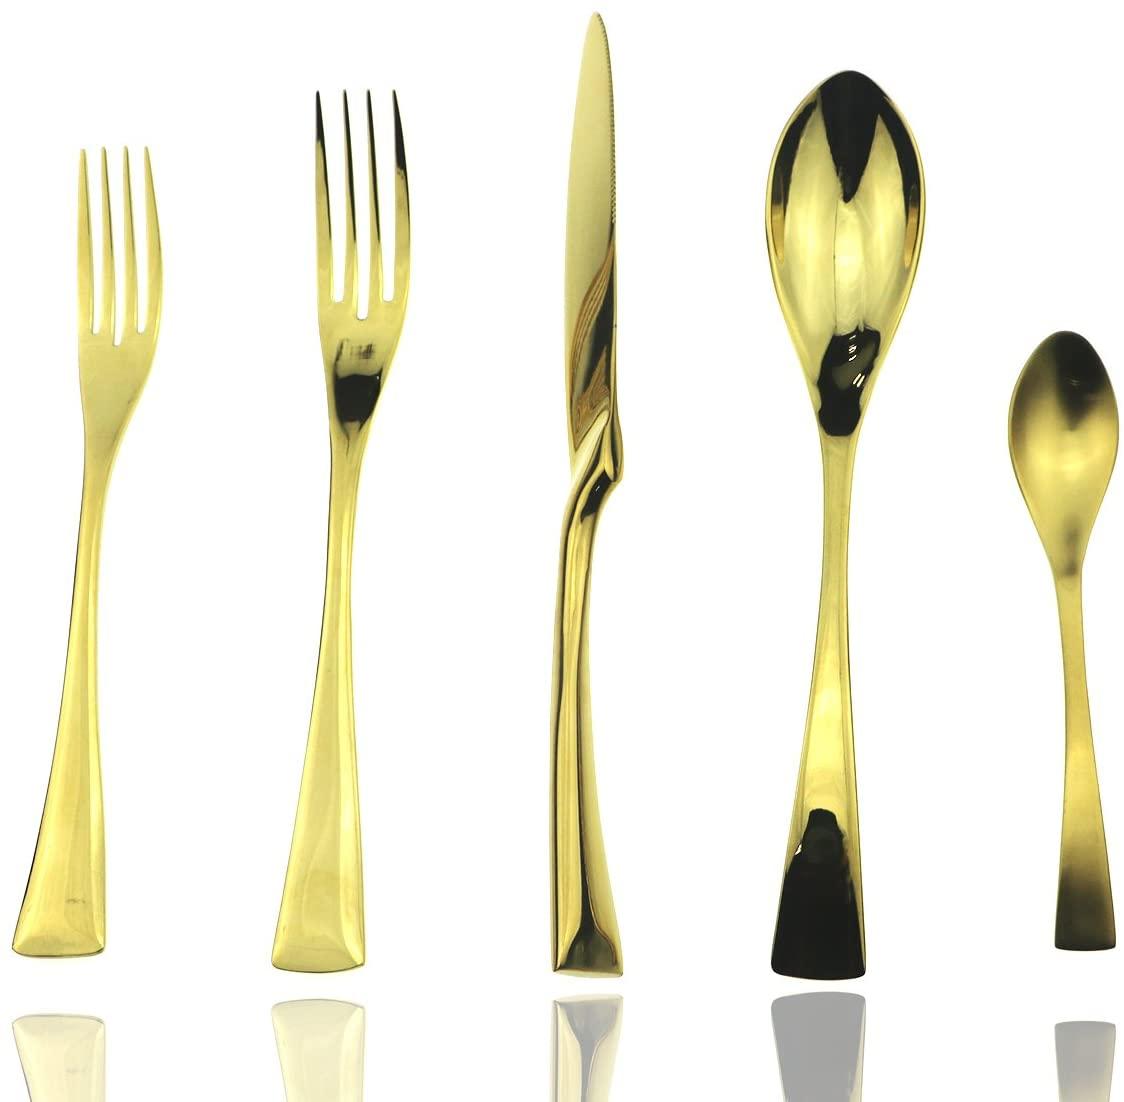 JASHII Luxury Mirror Polishing Gold Flatware Set - 20 Piece Silverware Sets 18/10 Stainless Steel Utensils Service For 4, Dinner Knife Fork Salad Fork w/DINNER COFFEE Spoon